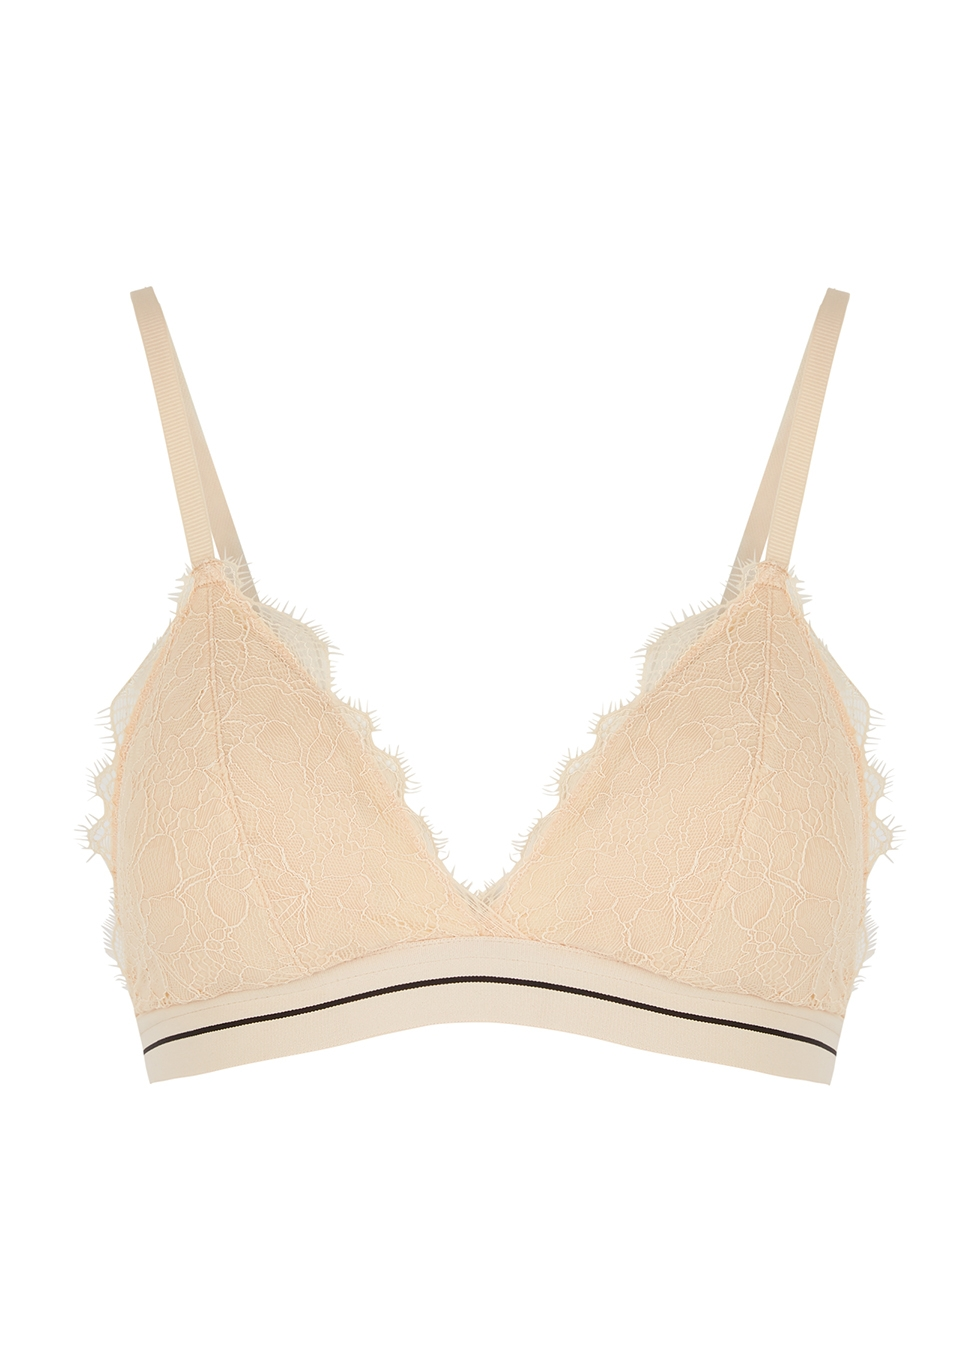 Darling almond lace bra